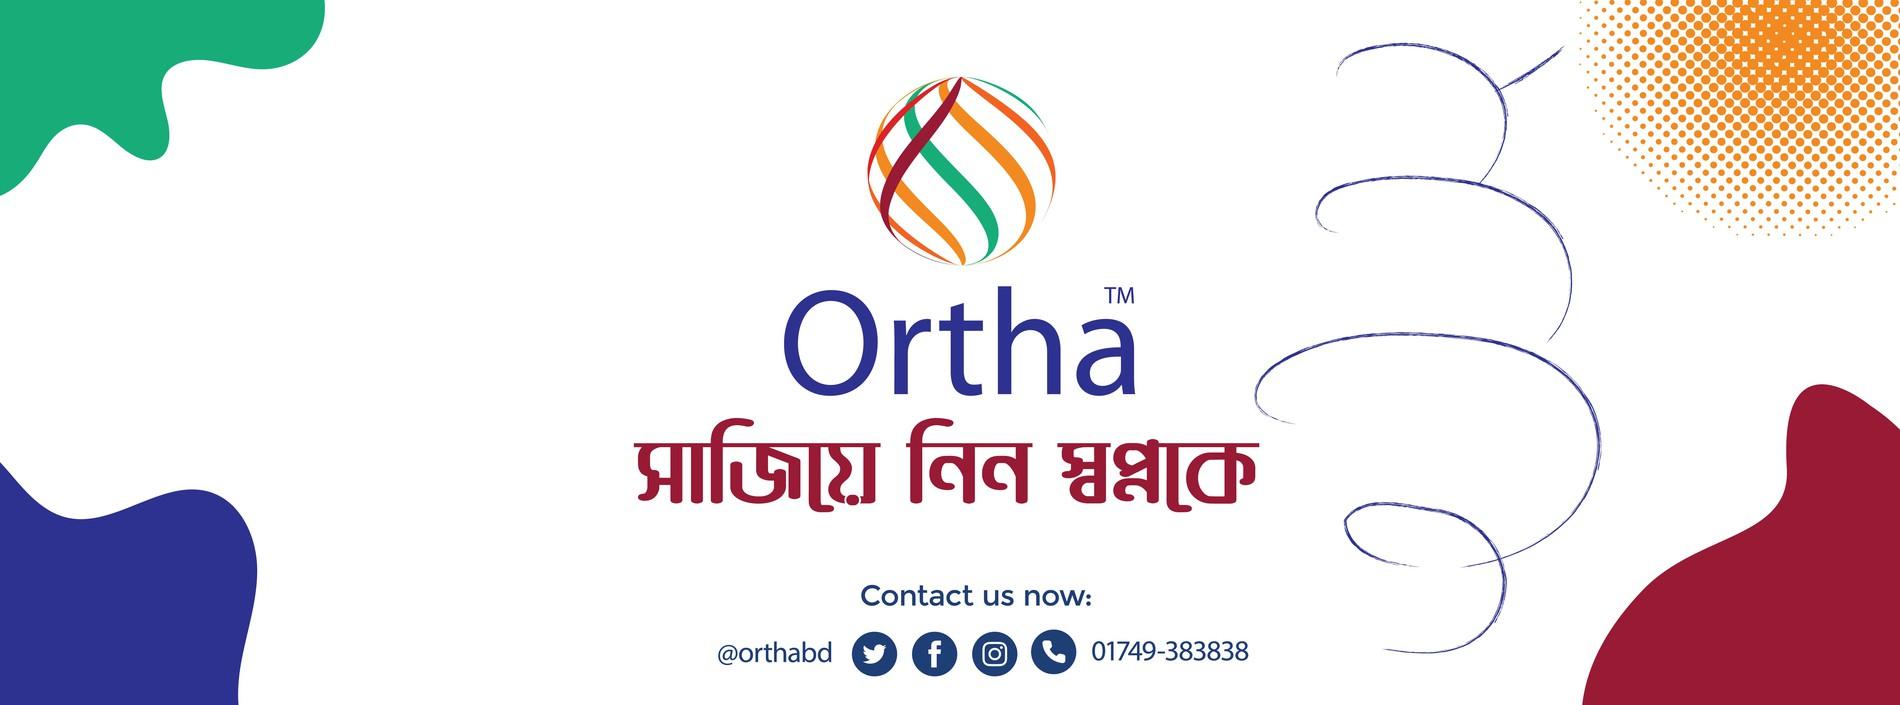 Ortha Panel-Twill